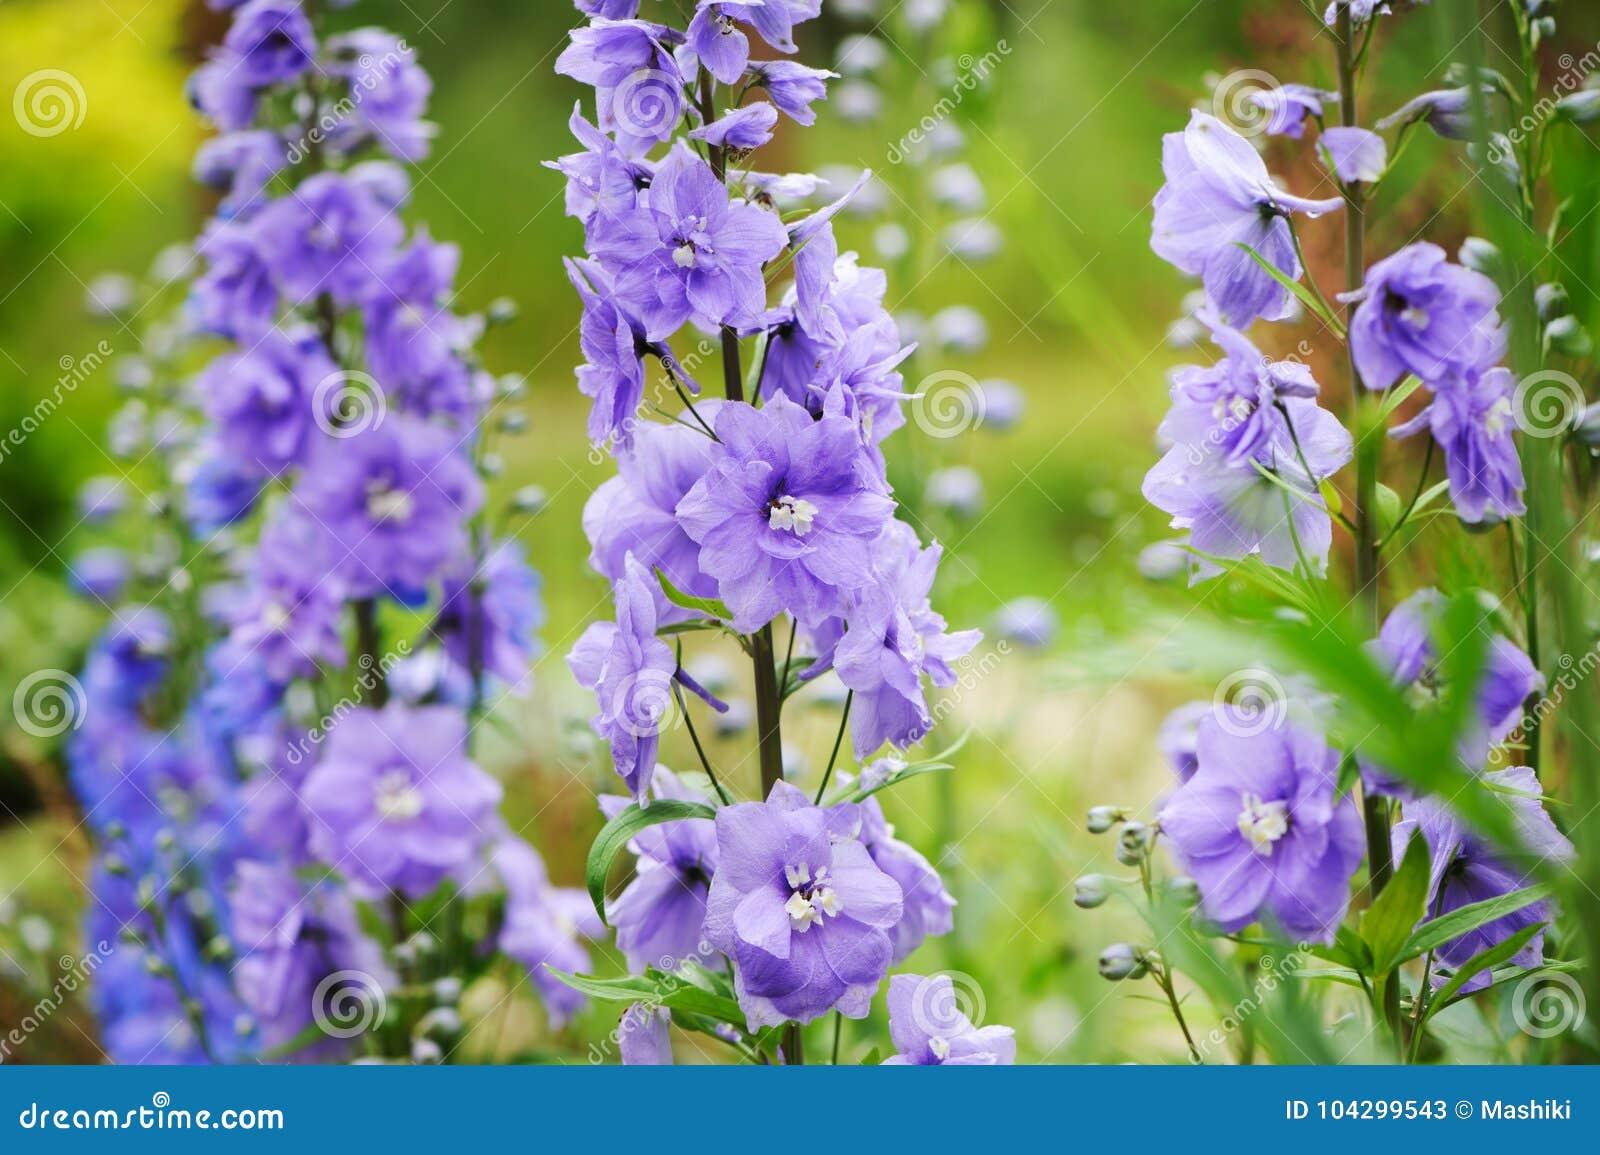 Flowering Delphinium Closeup In Summer Garden Stock Image Image